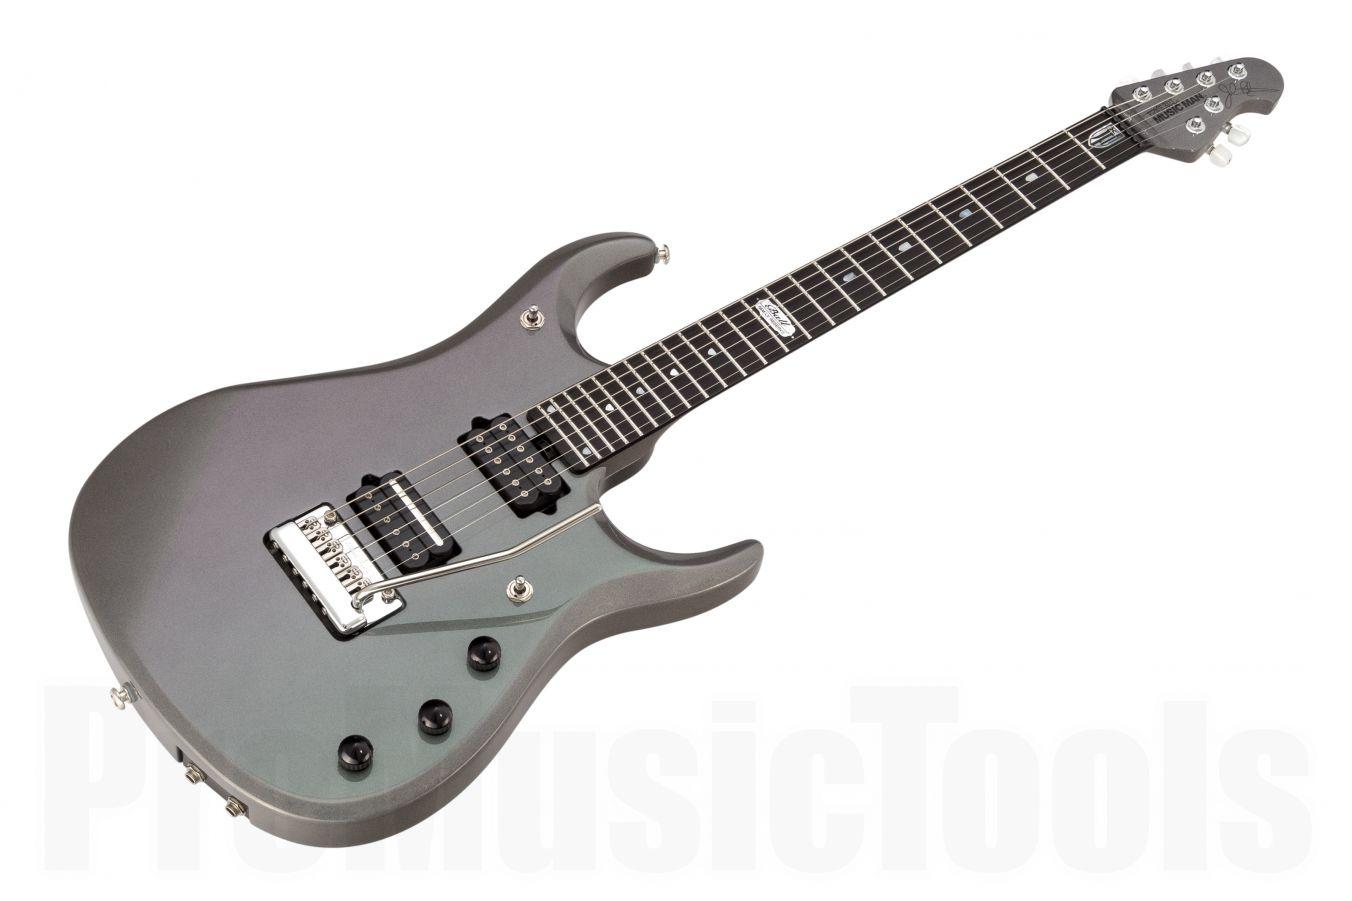 Music Man USA John Petrucci JPXI SL - BFR Sledge Limited Edition